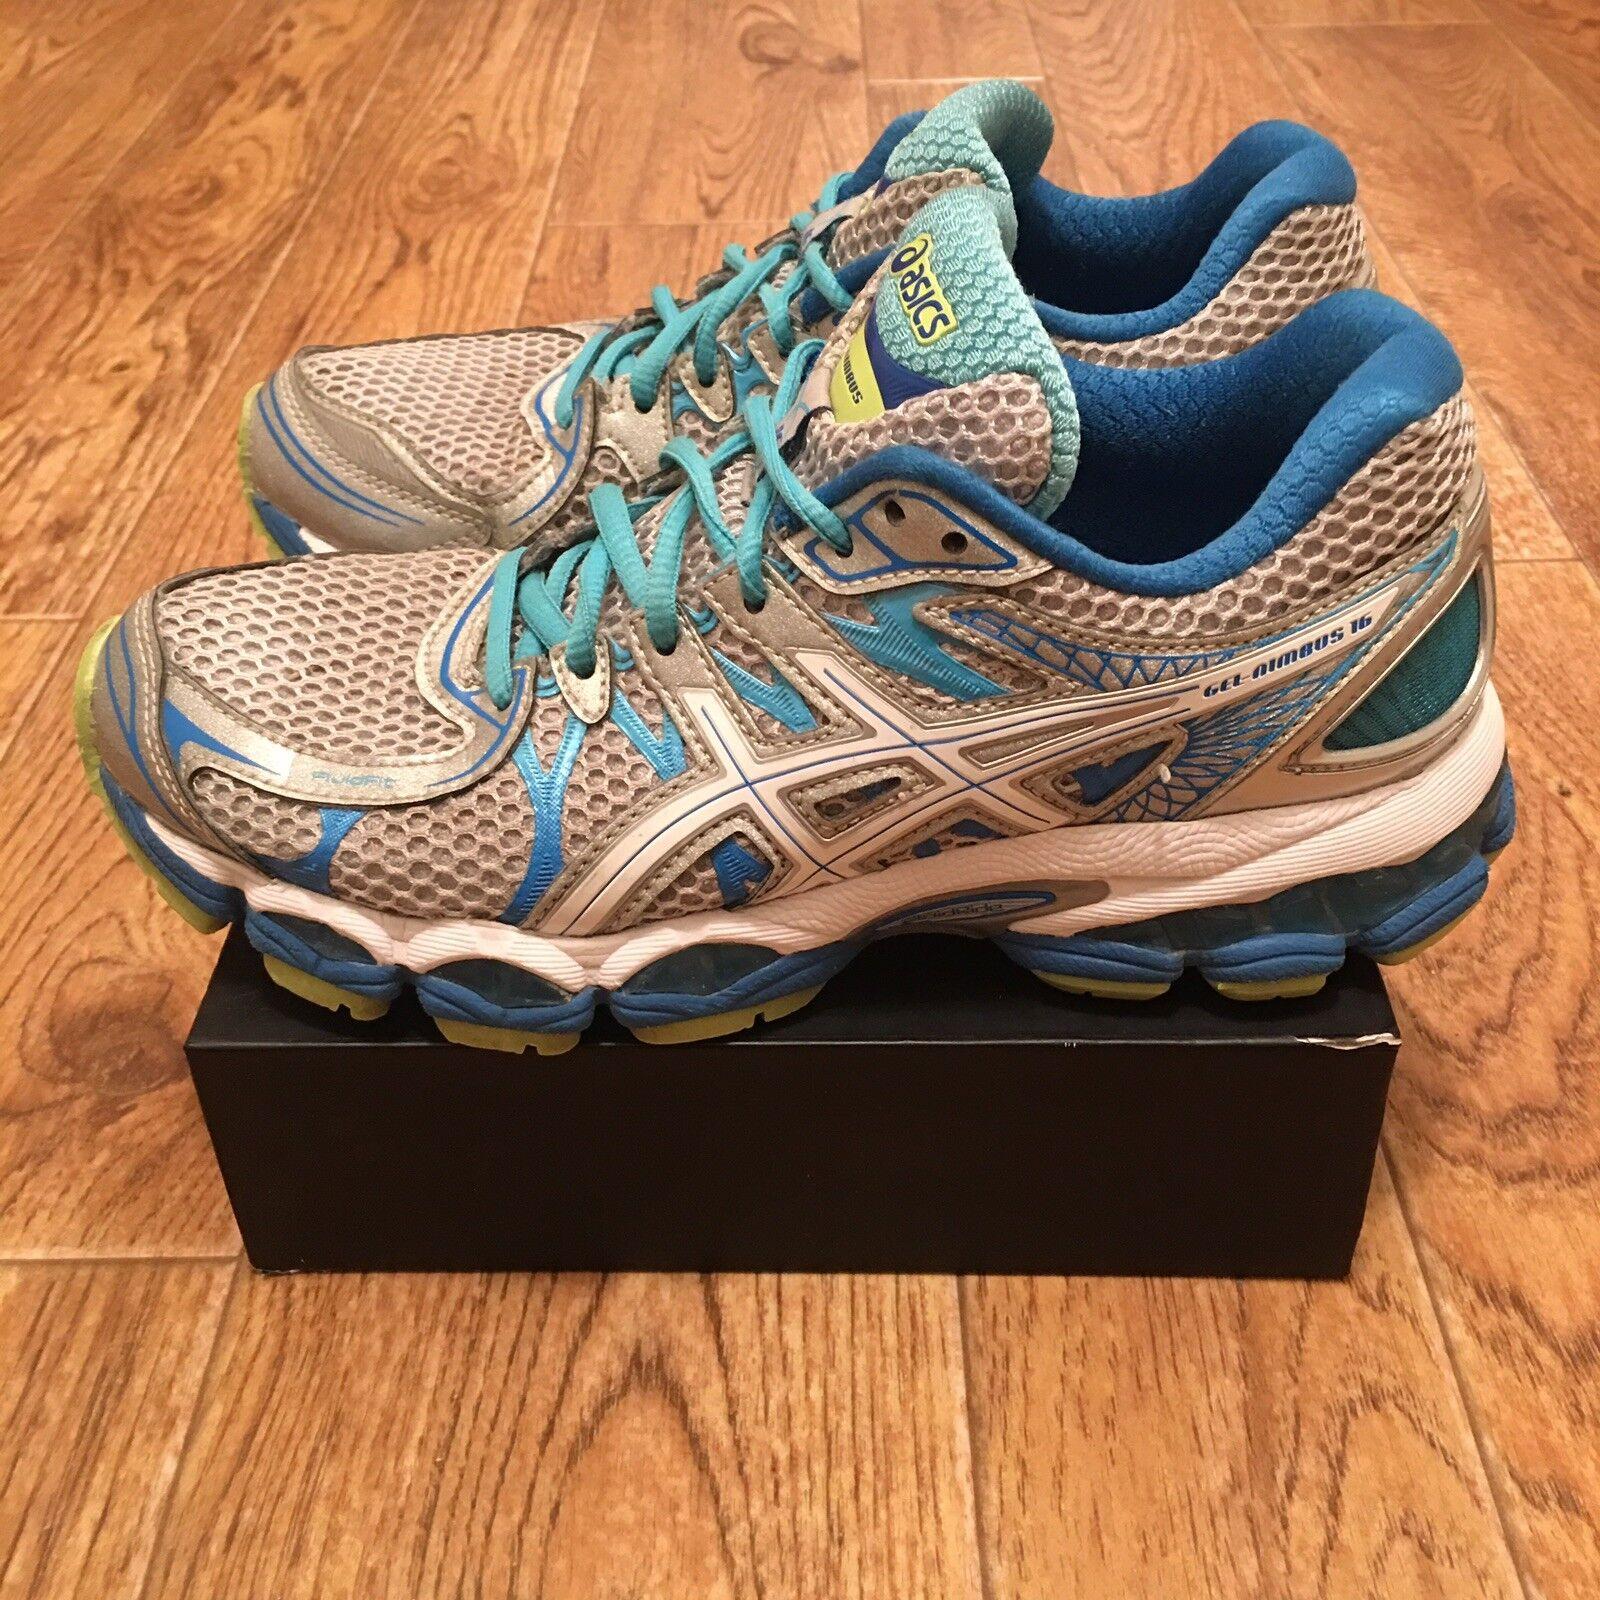 Asics Gel Nimbus 16 T485N Womens Running shoes Multi color US Size 6.5